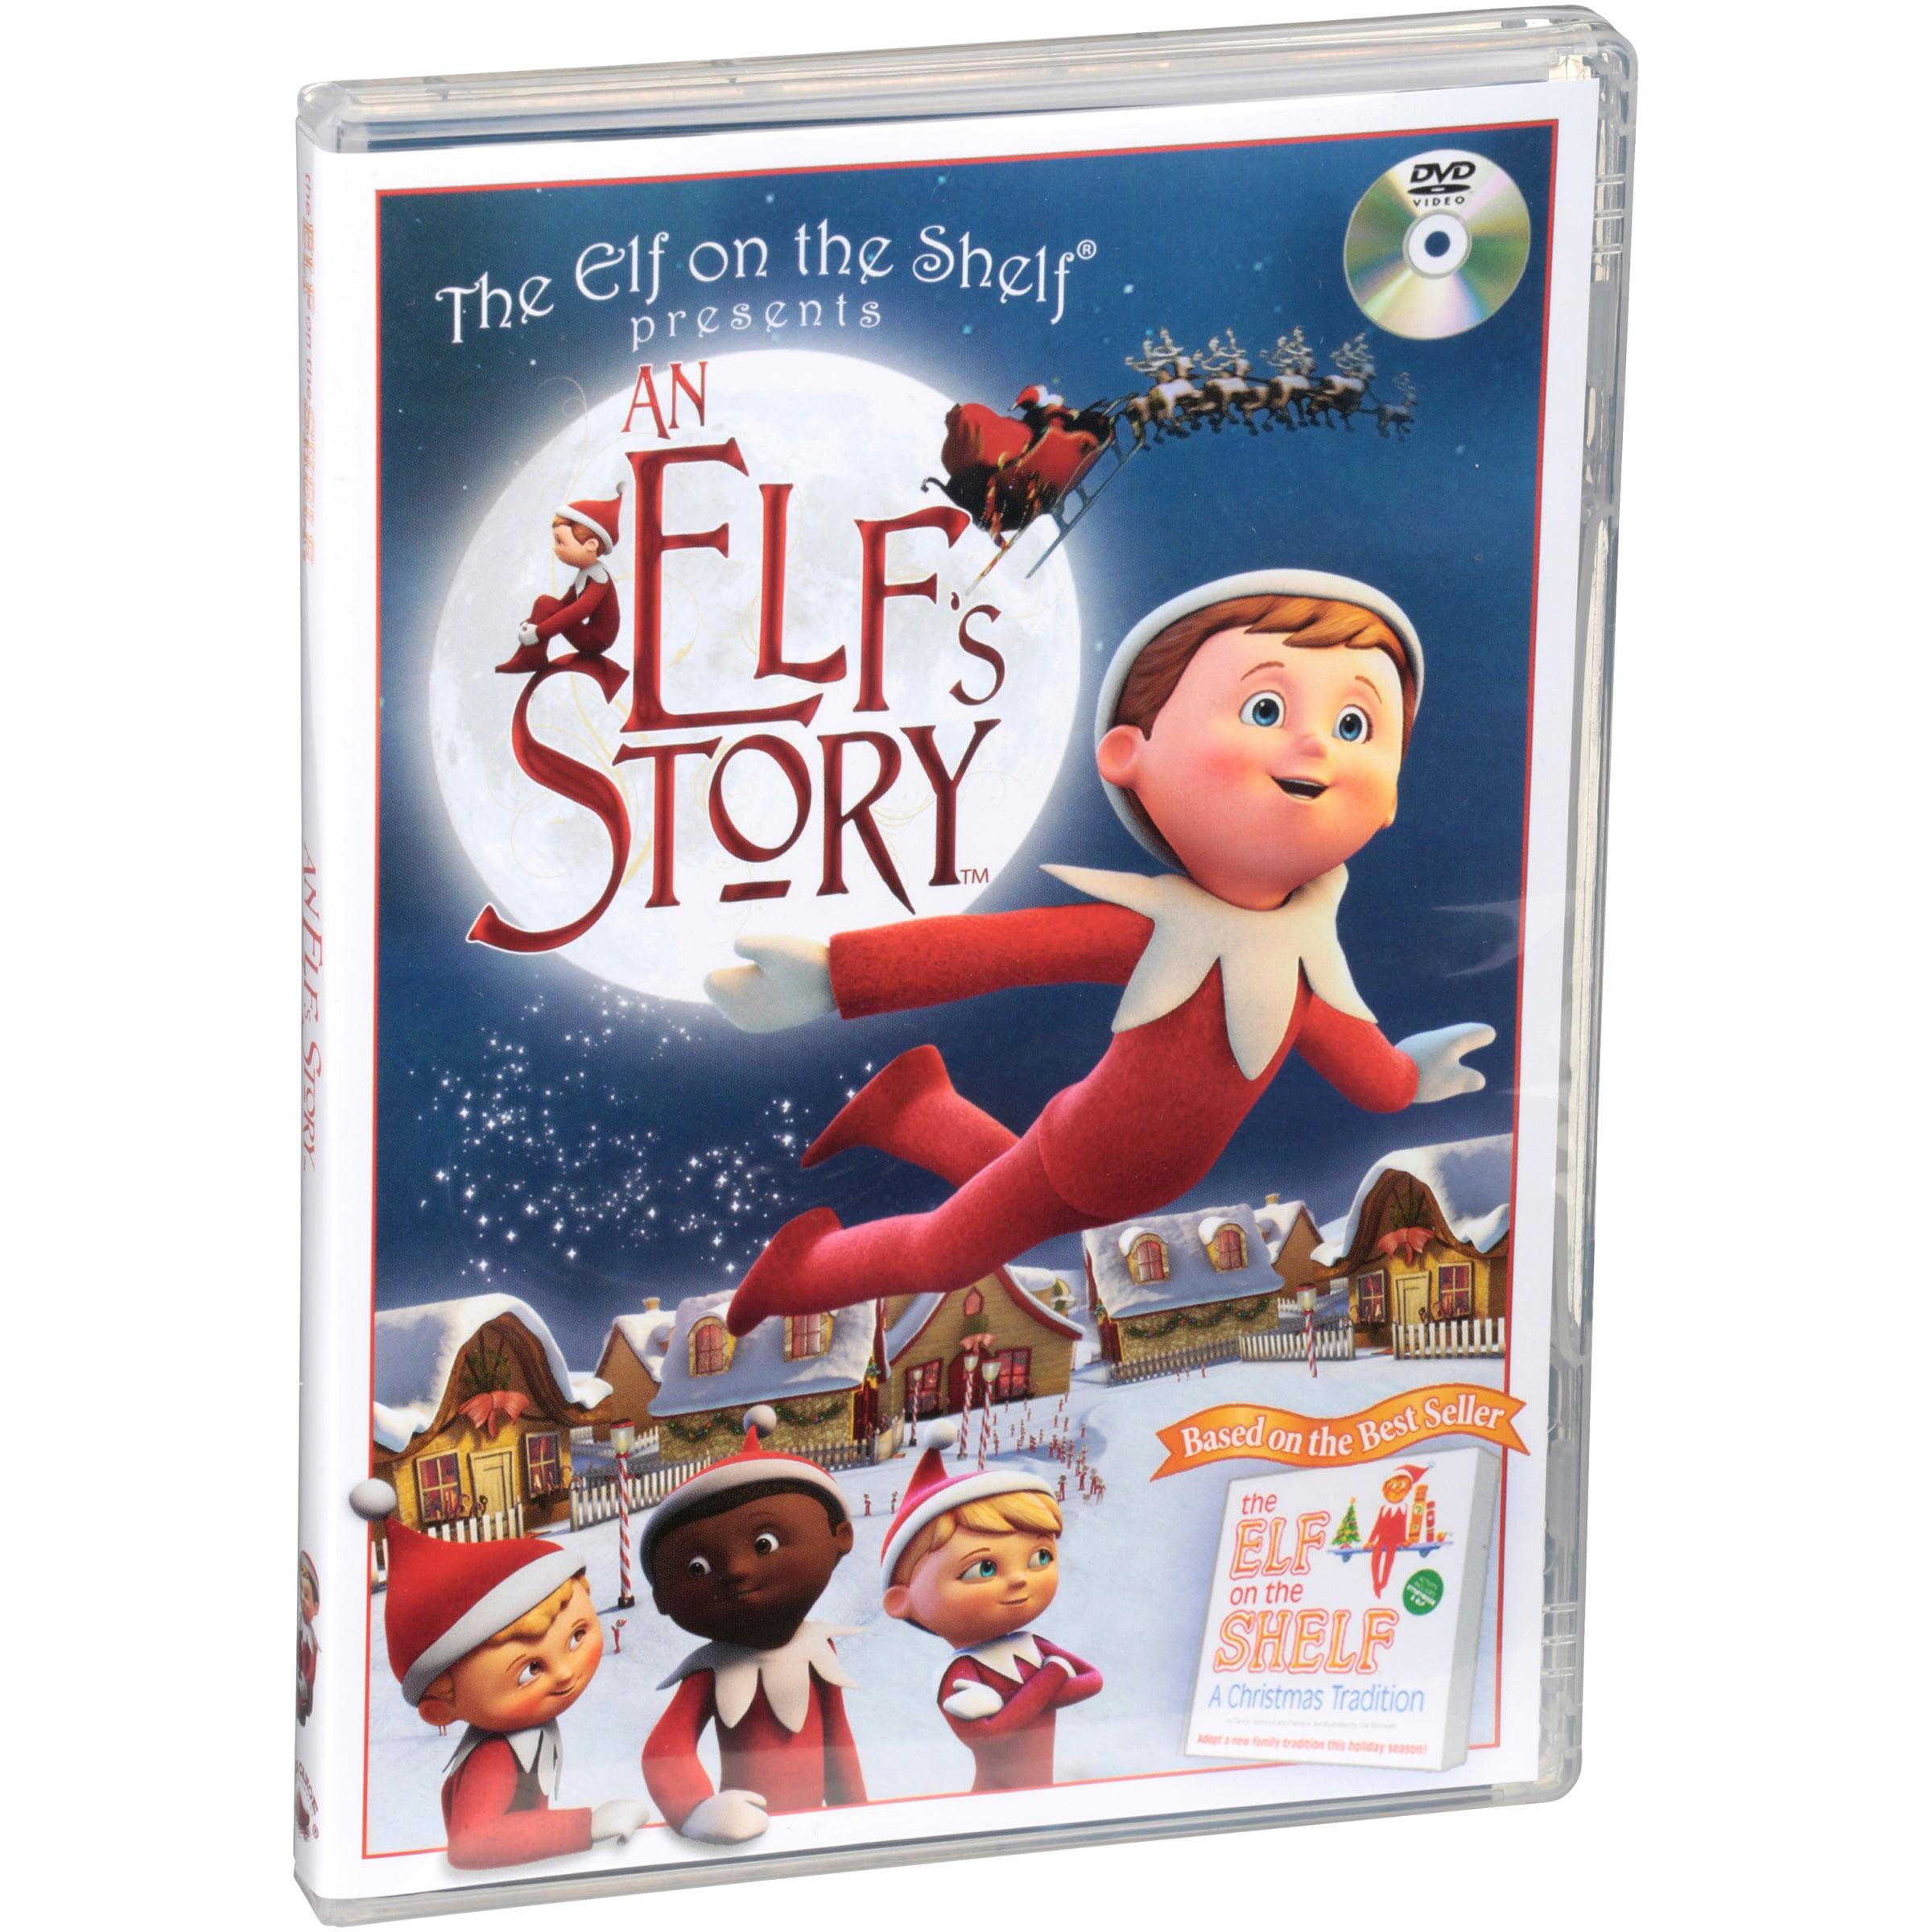 Elf on the Shelf® An Elf's Story™ DVD